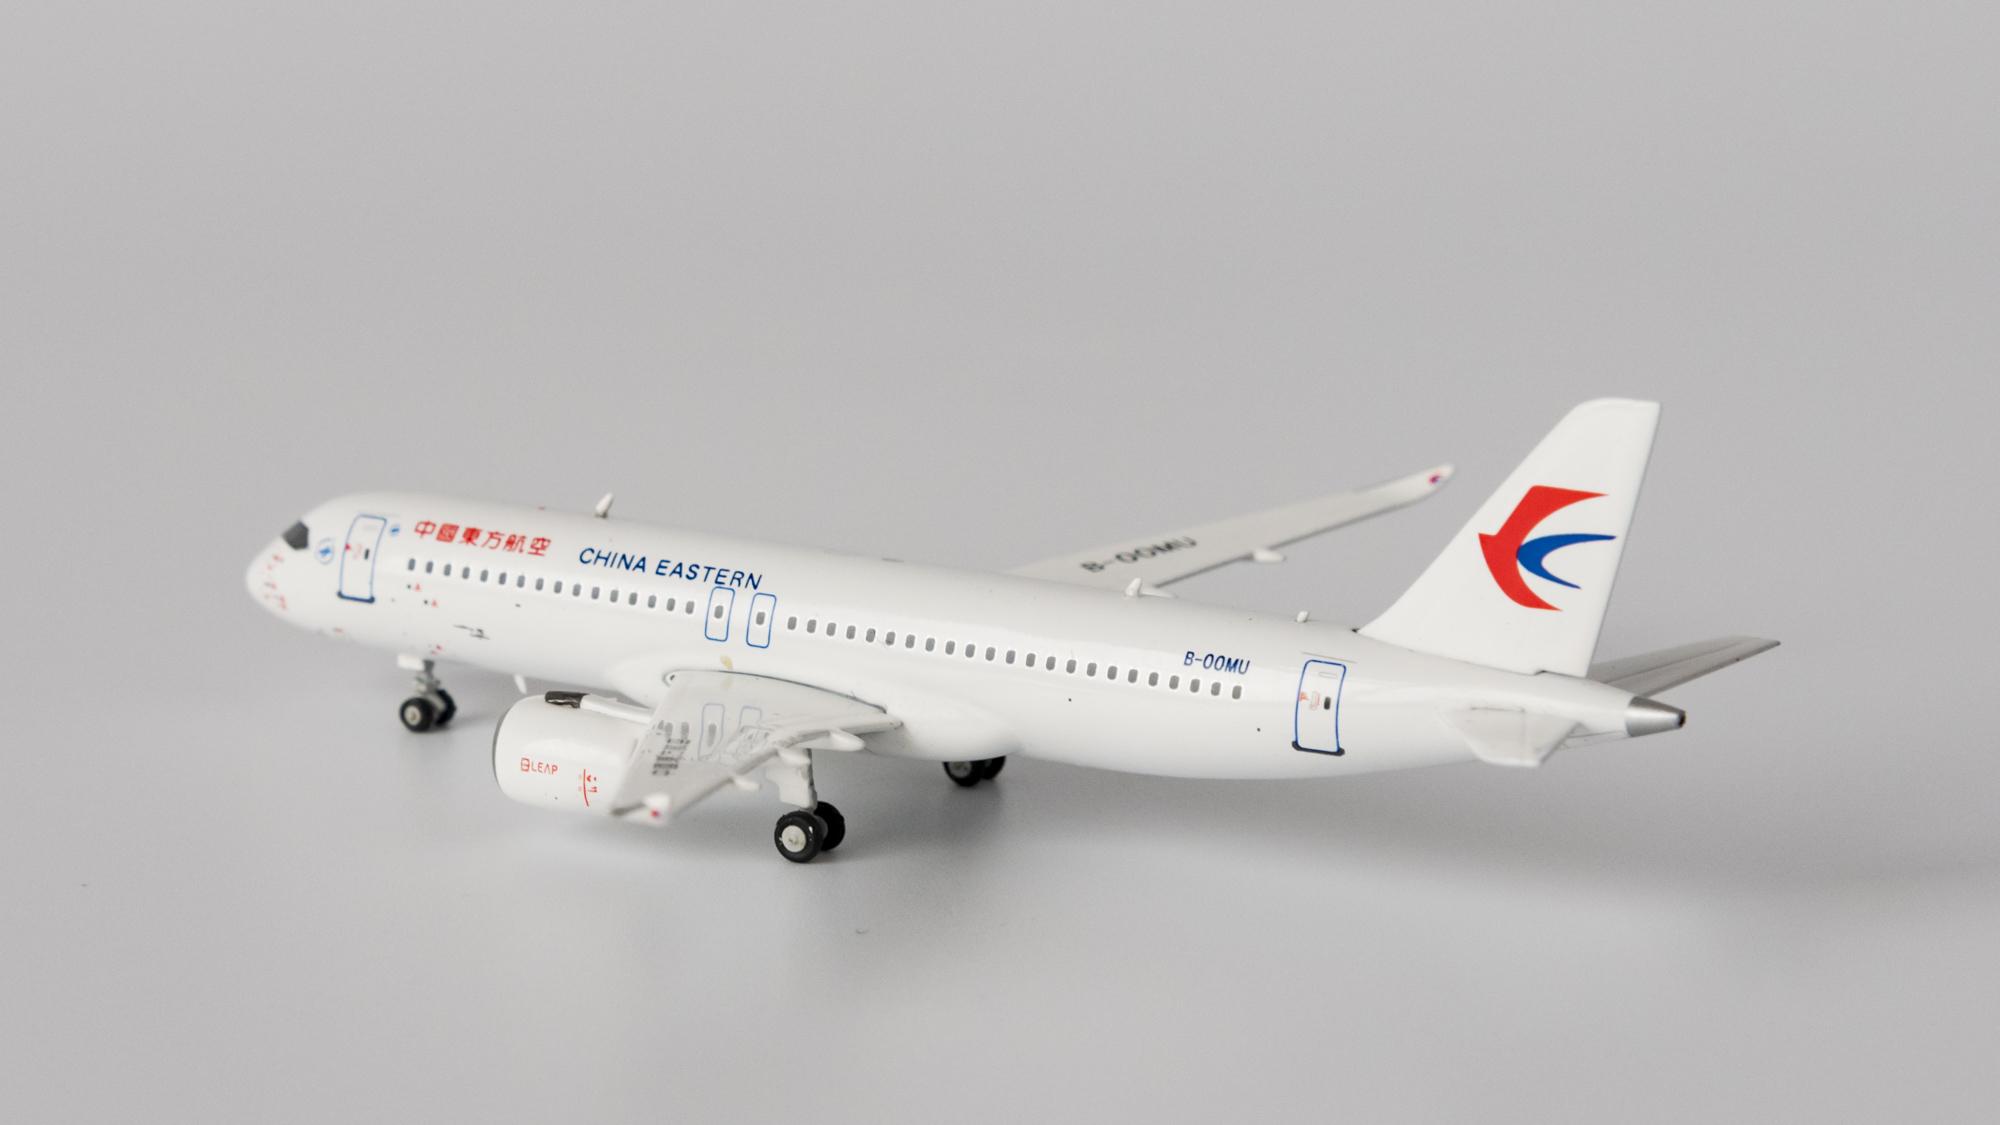 NG model 1//400 China Eastern COMAC C919 B-00MU miniature model